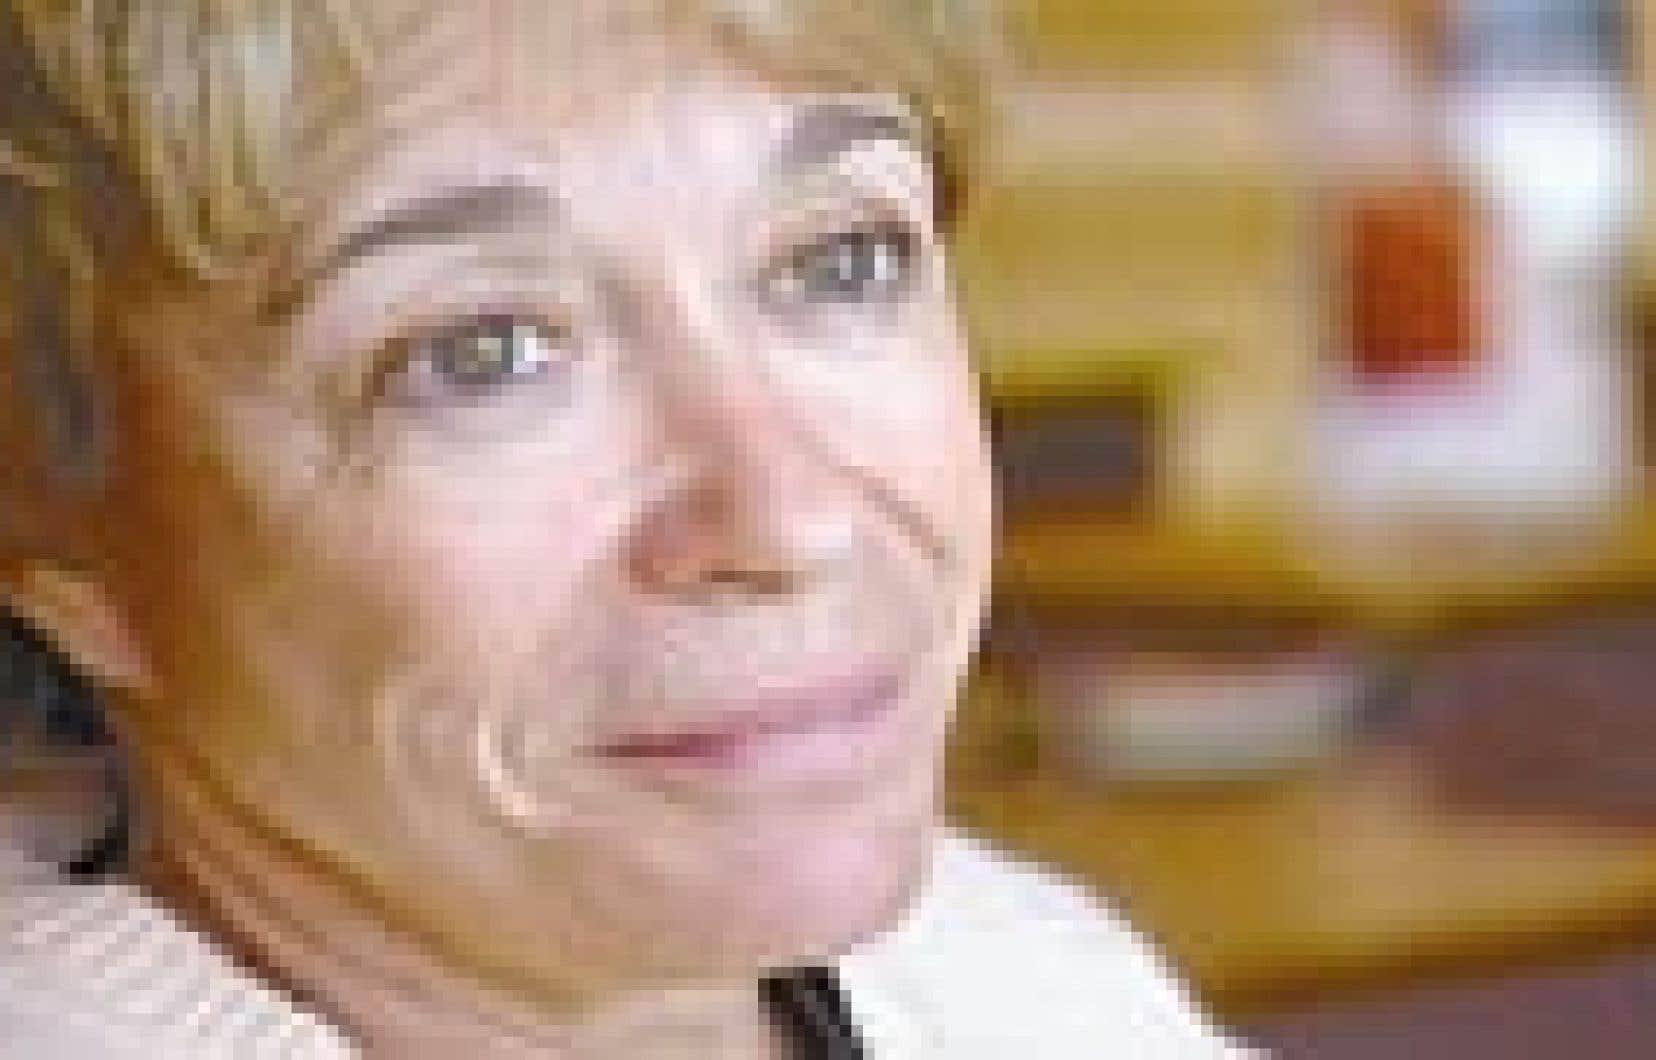 Tricia Dickson,Valerie Curtin Hot pics & movies Julie Benz,Mark Sheppard (born 1964)